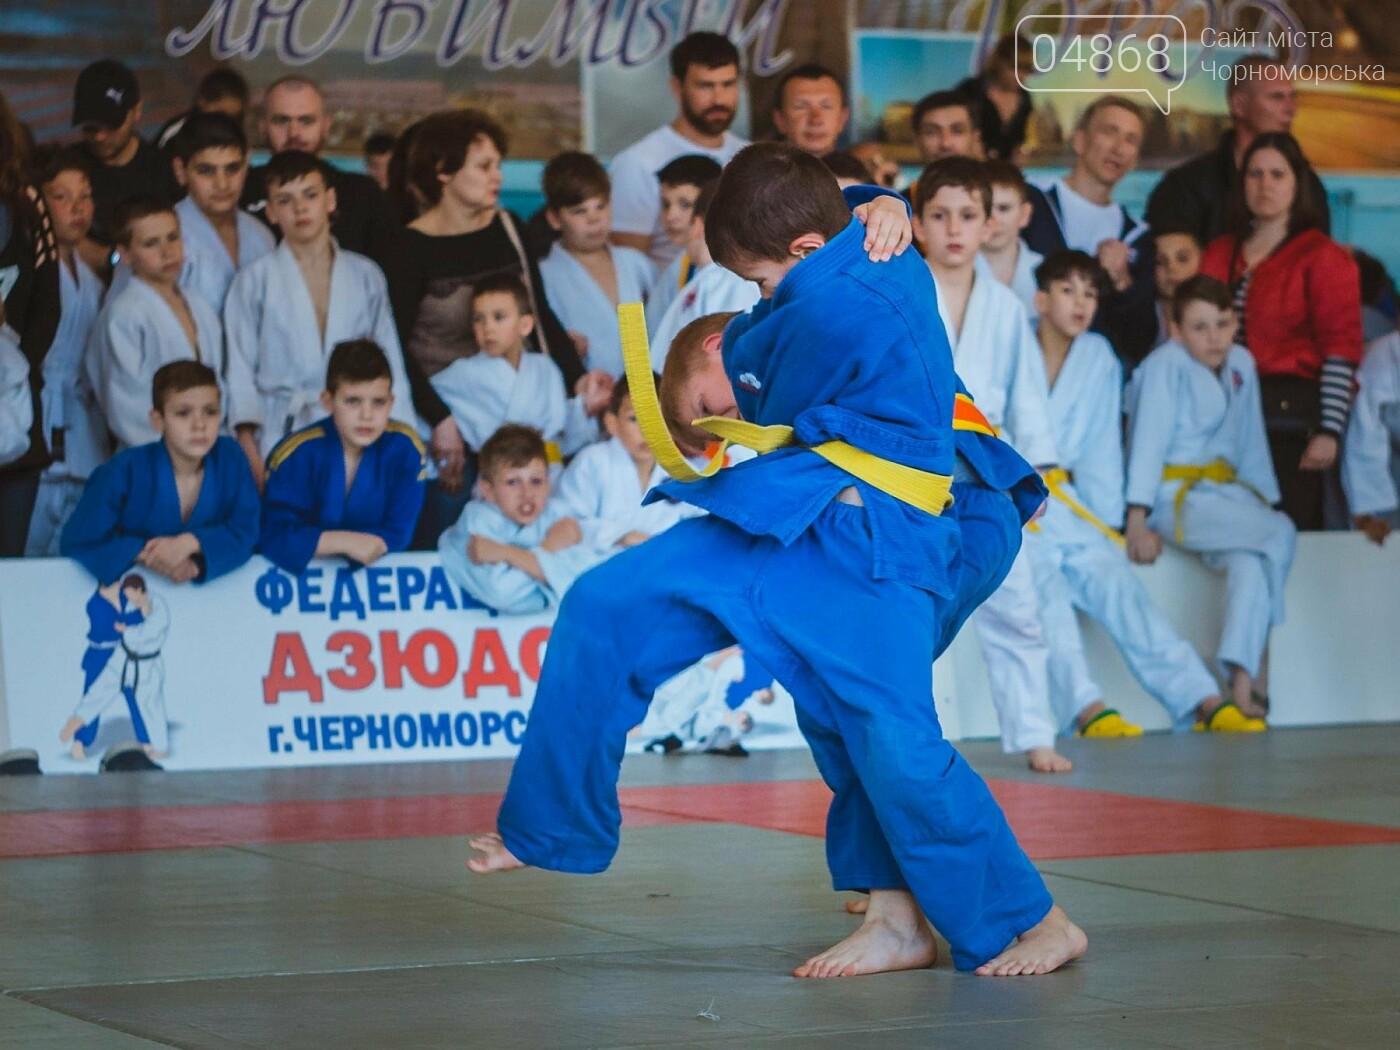 В Черноморске прошел турнир по дзюдо на Кубок мэра, фото-18